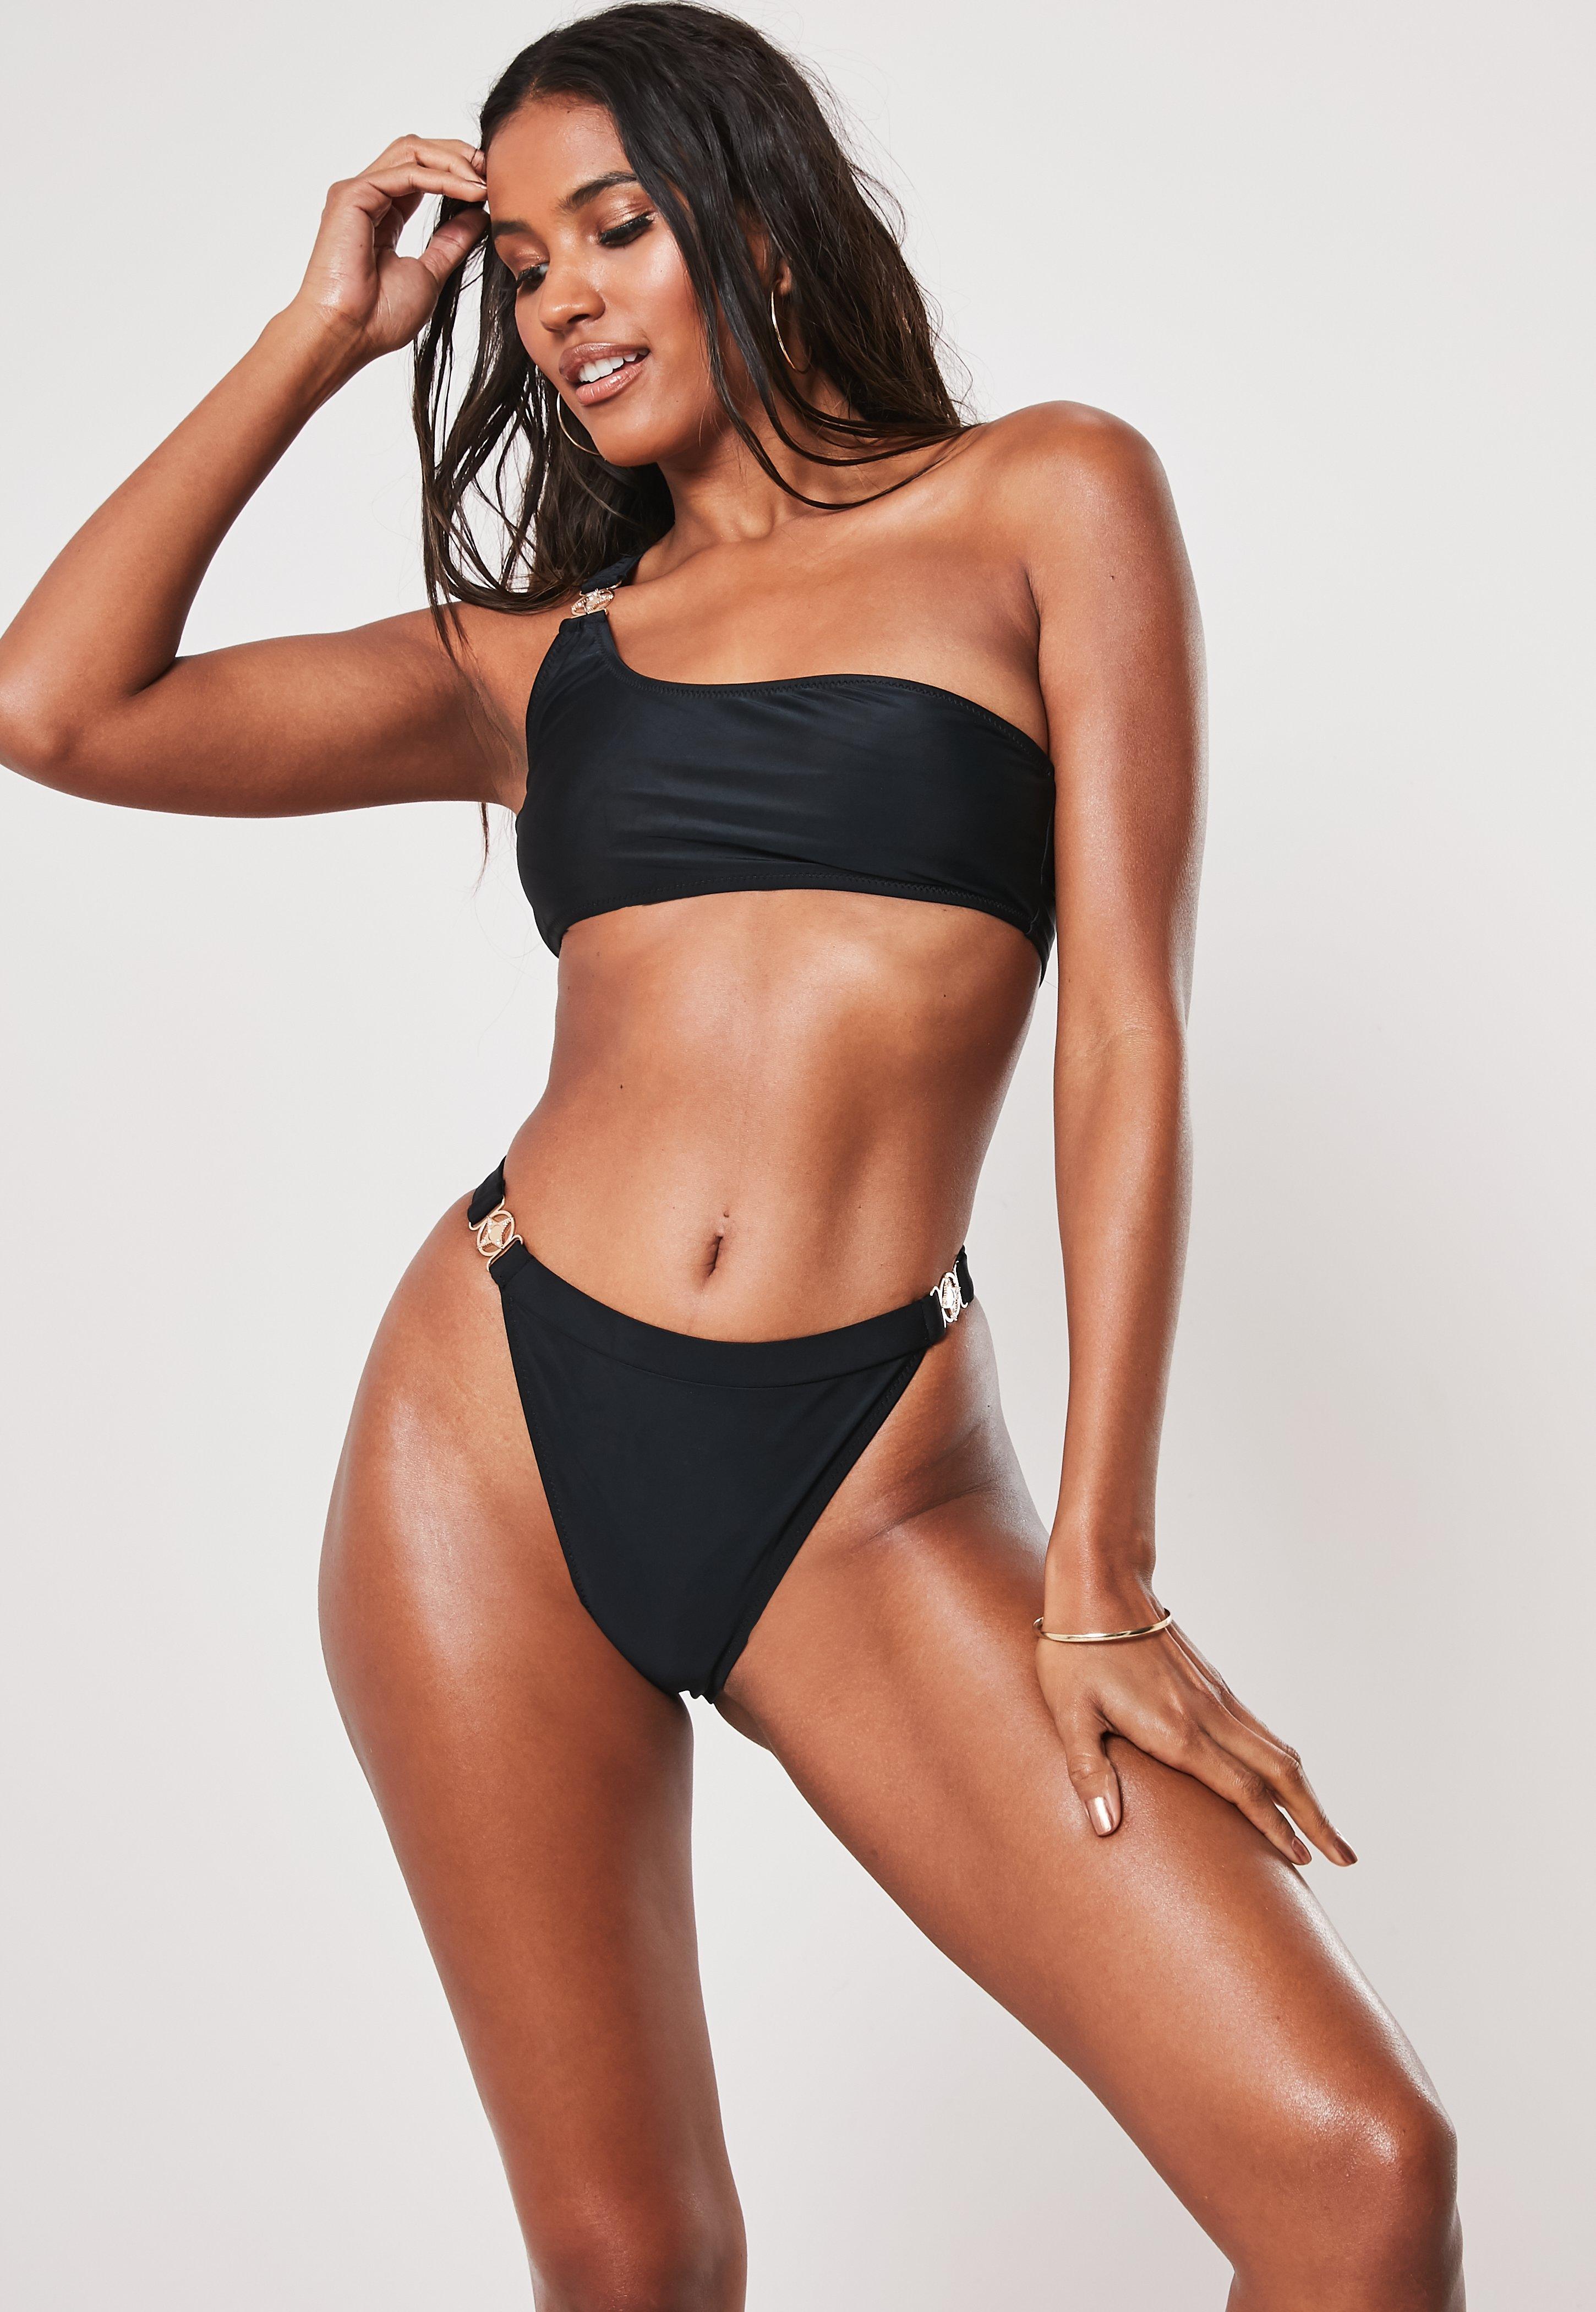 968246efe0 High Leg Bikinis & Swimsuits - Swimwear & Beachwear - Clothing